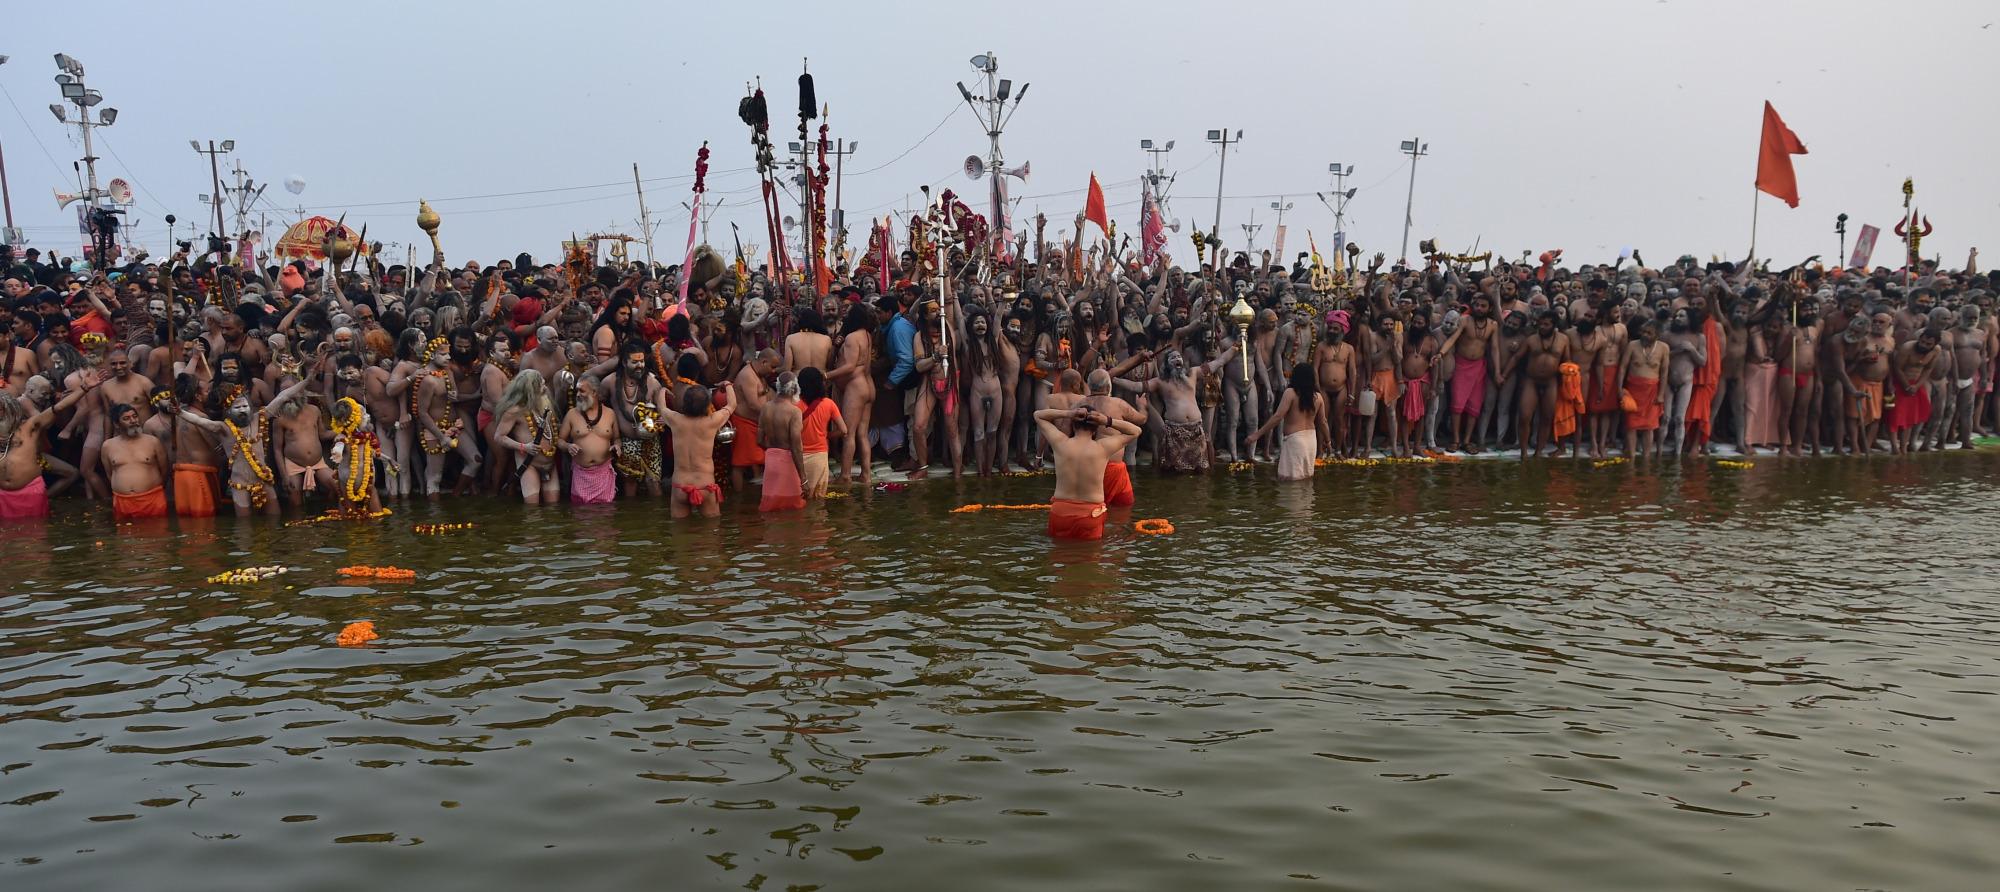 Sadhus take holy dip on the occasion of 'Mauni Amavasya' at Sangam during the Kumbh Mela 2019